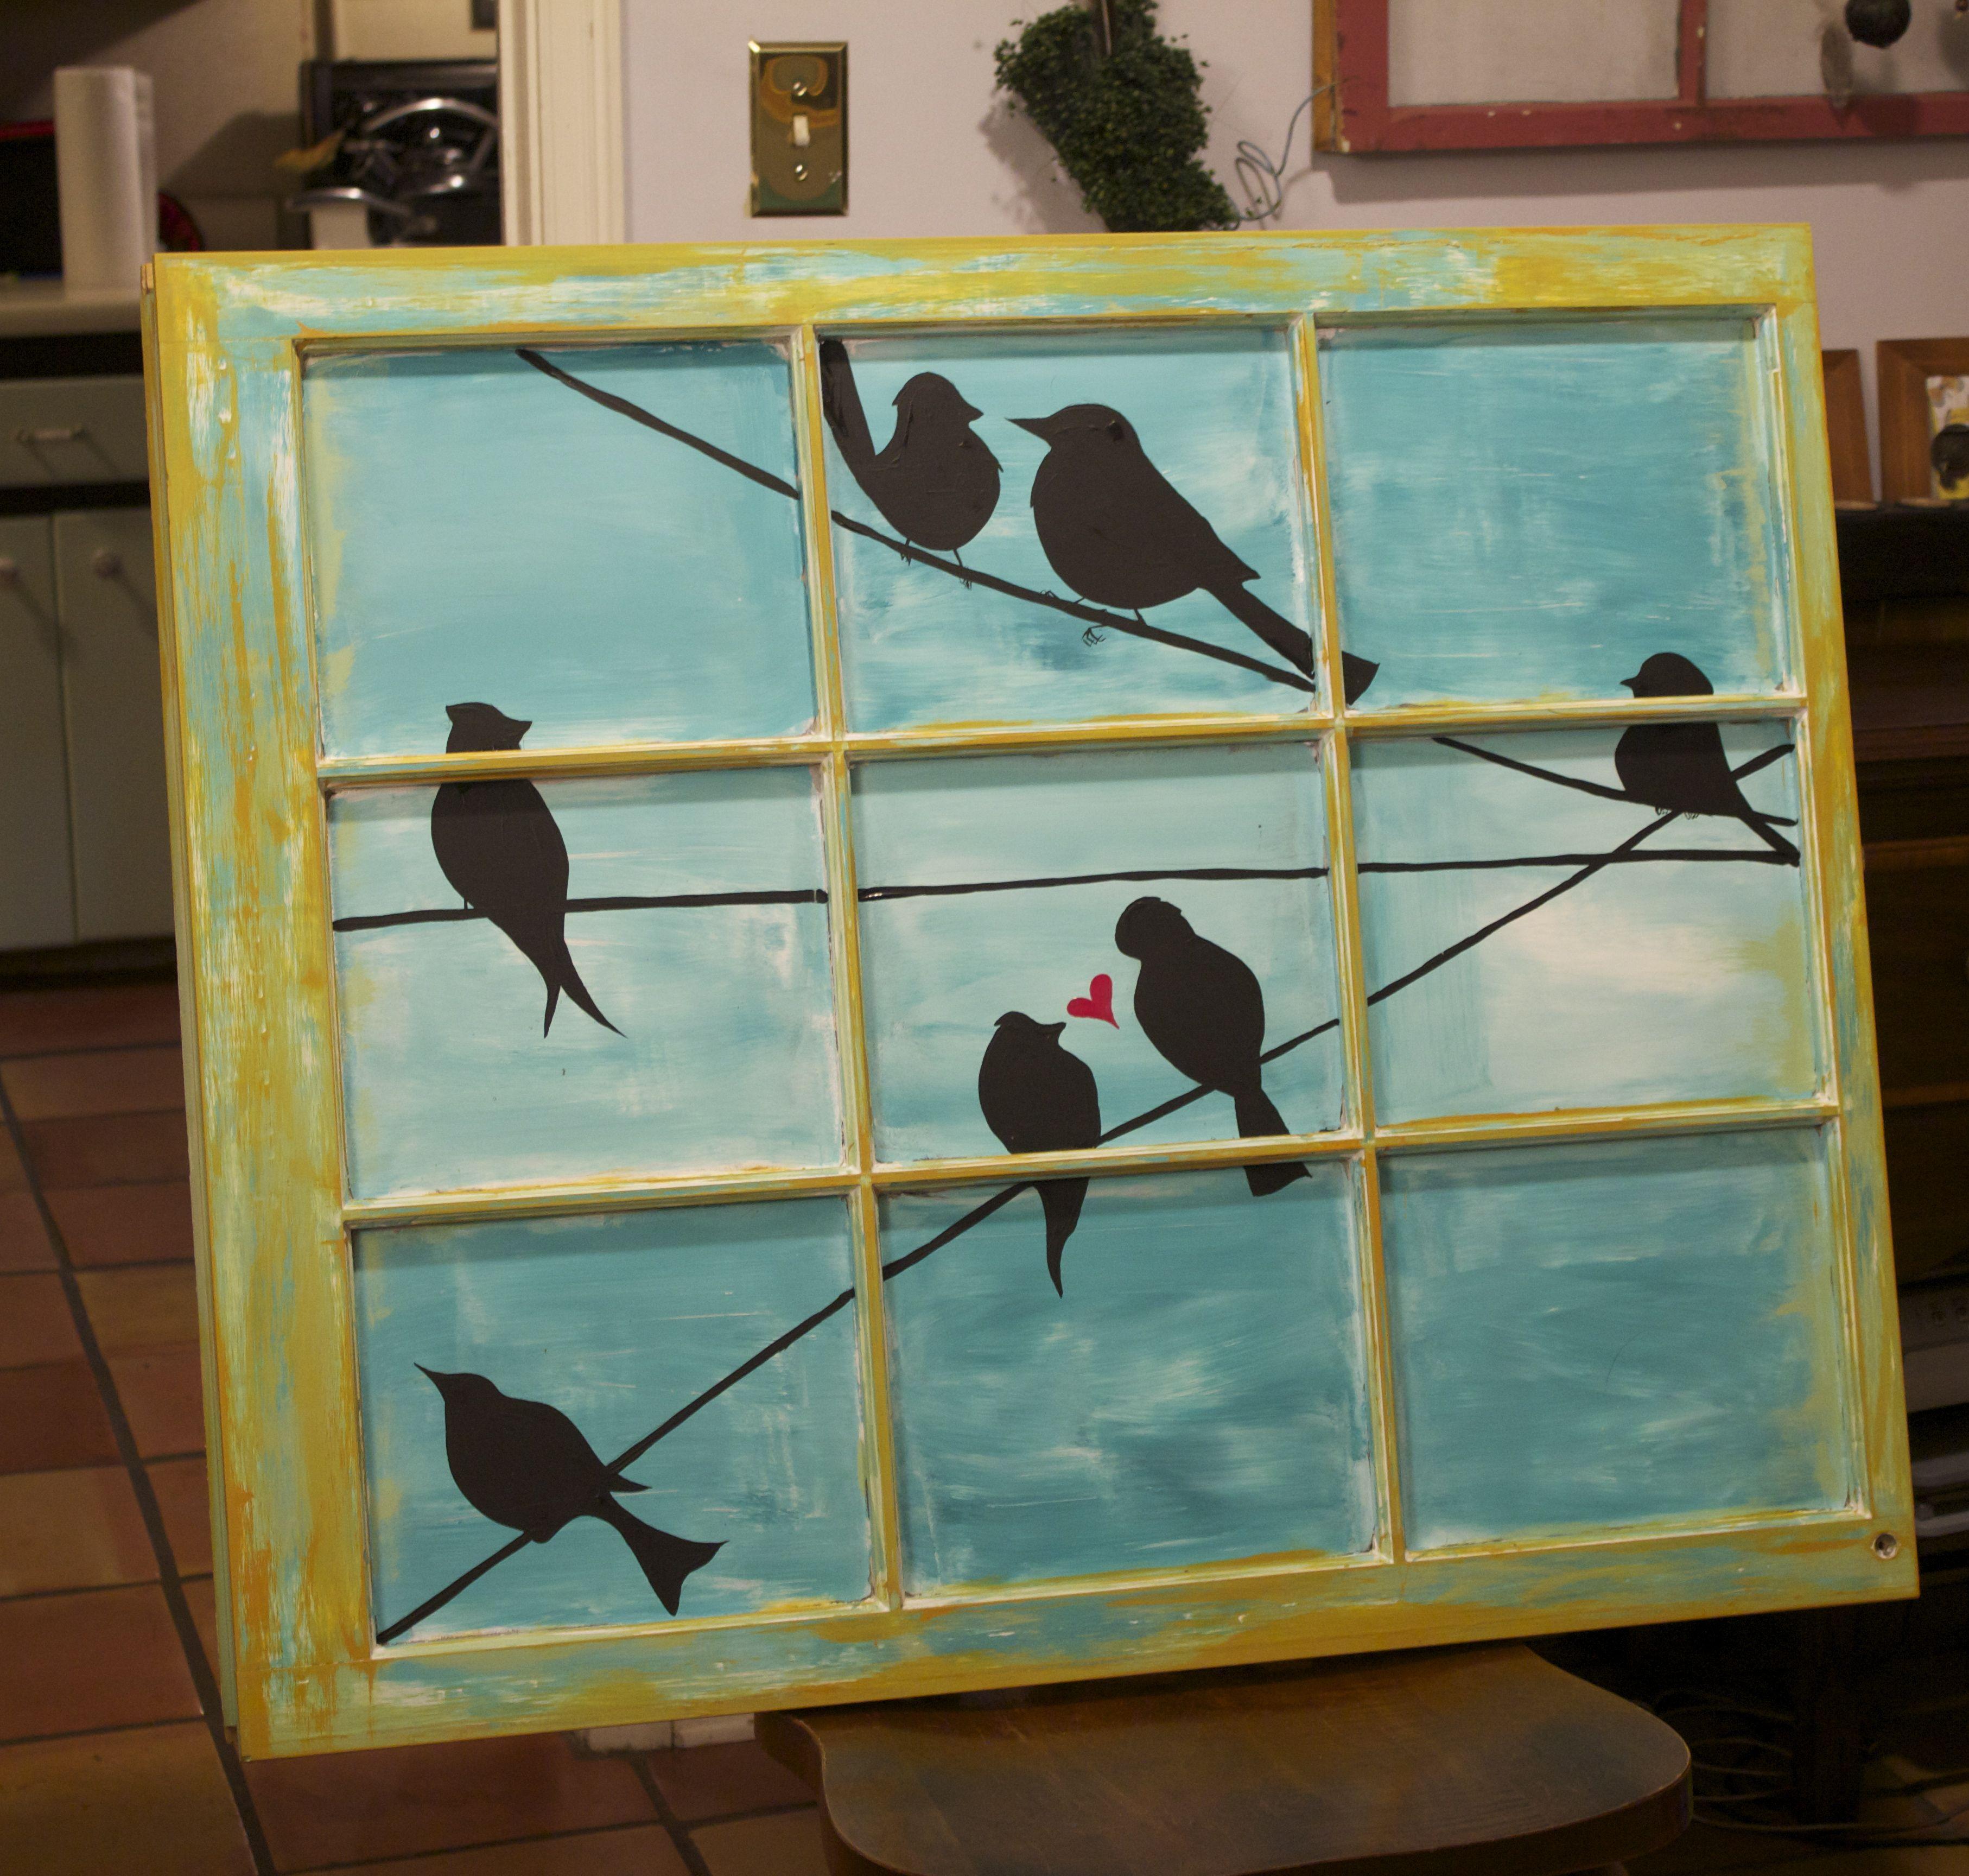 Window pane ideas  pin by mallory weeks on window panes  pinterest  repurpose window